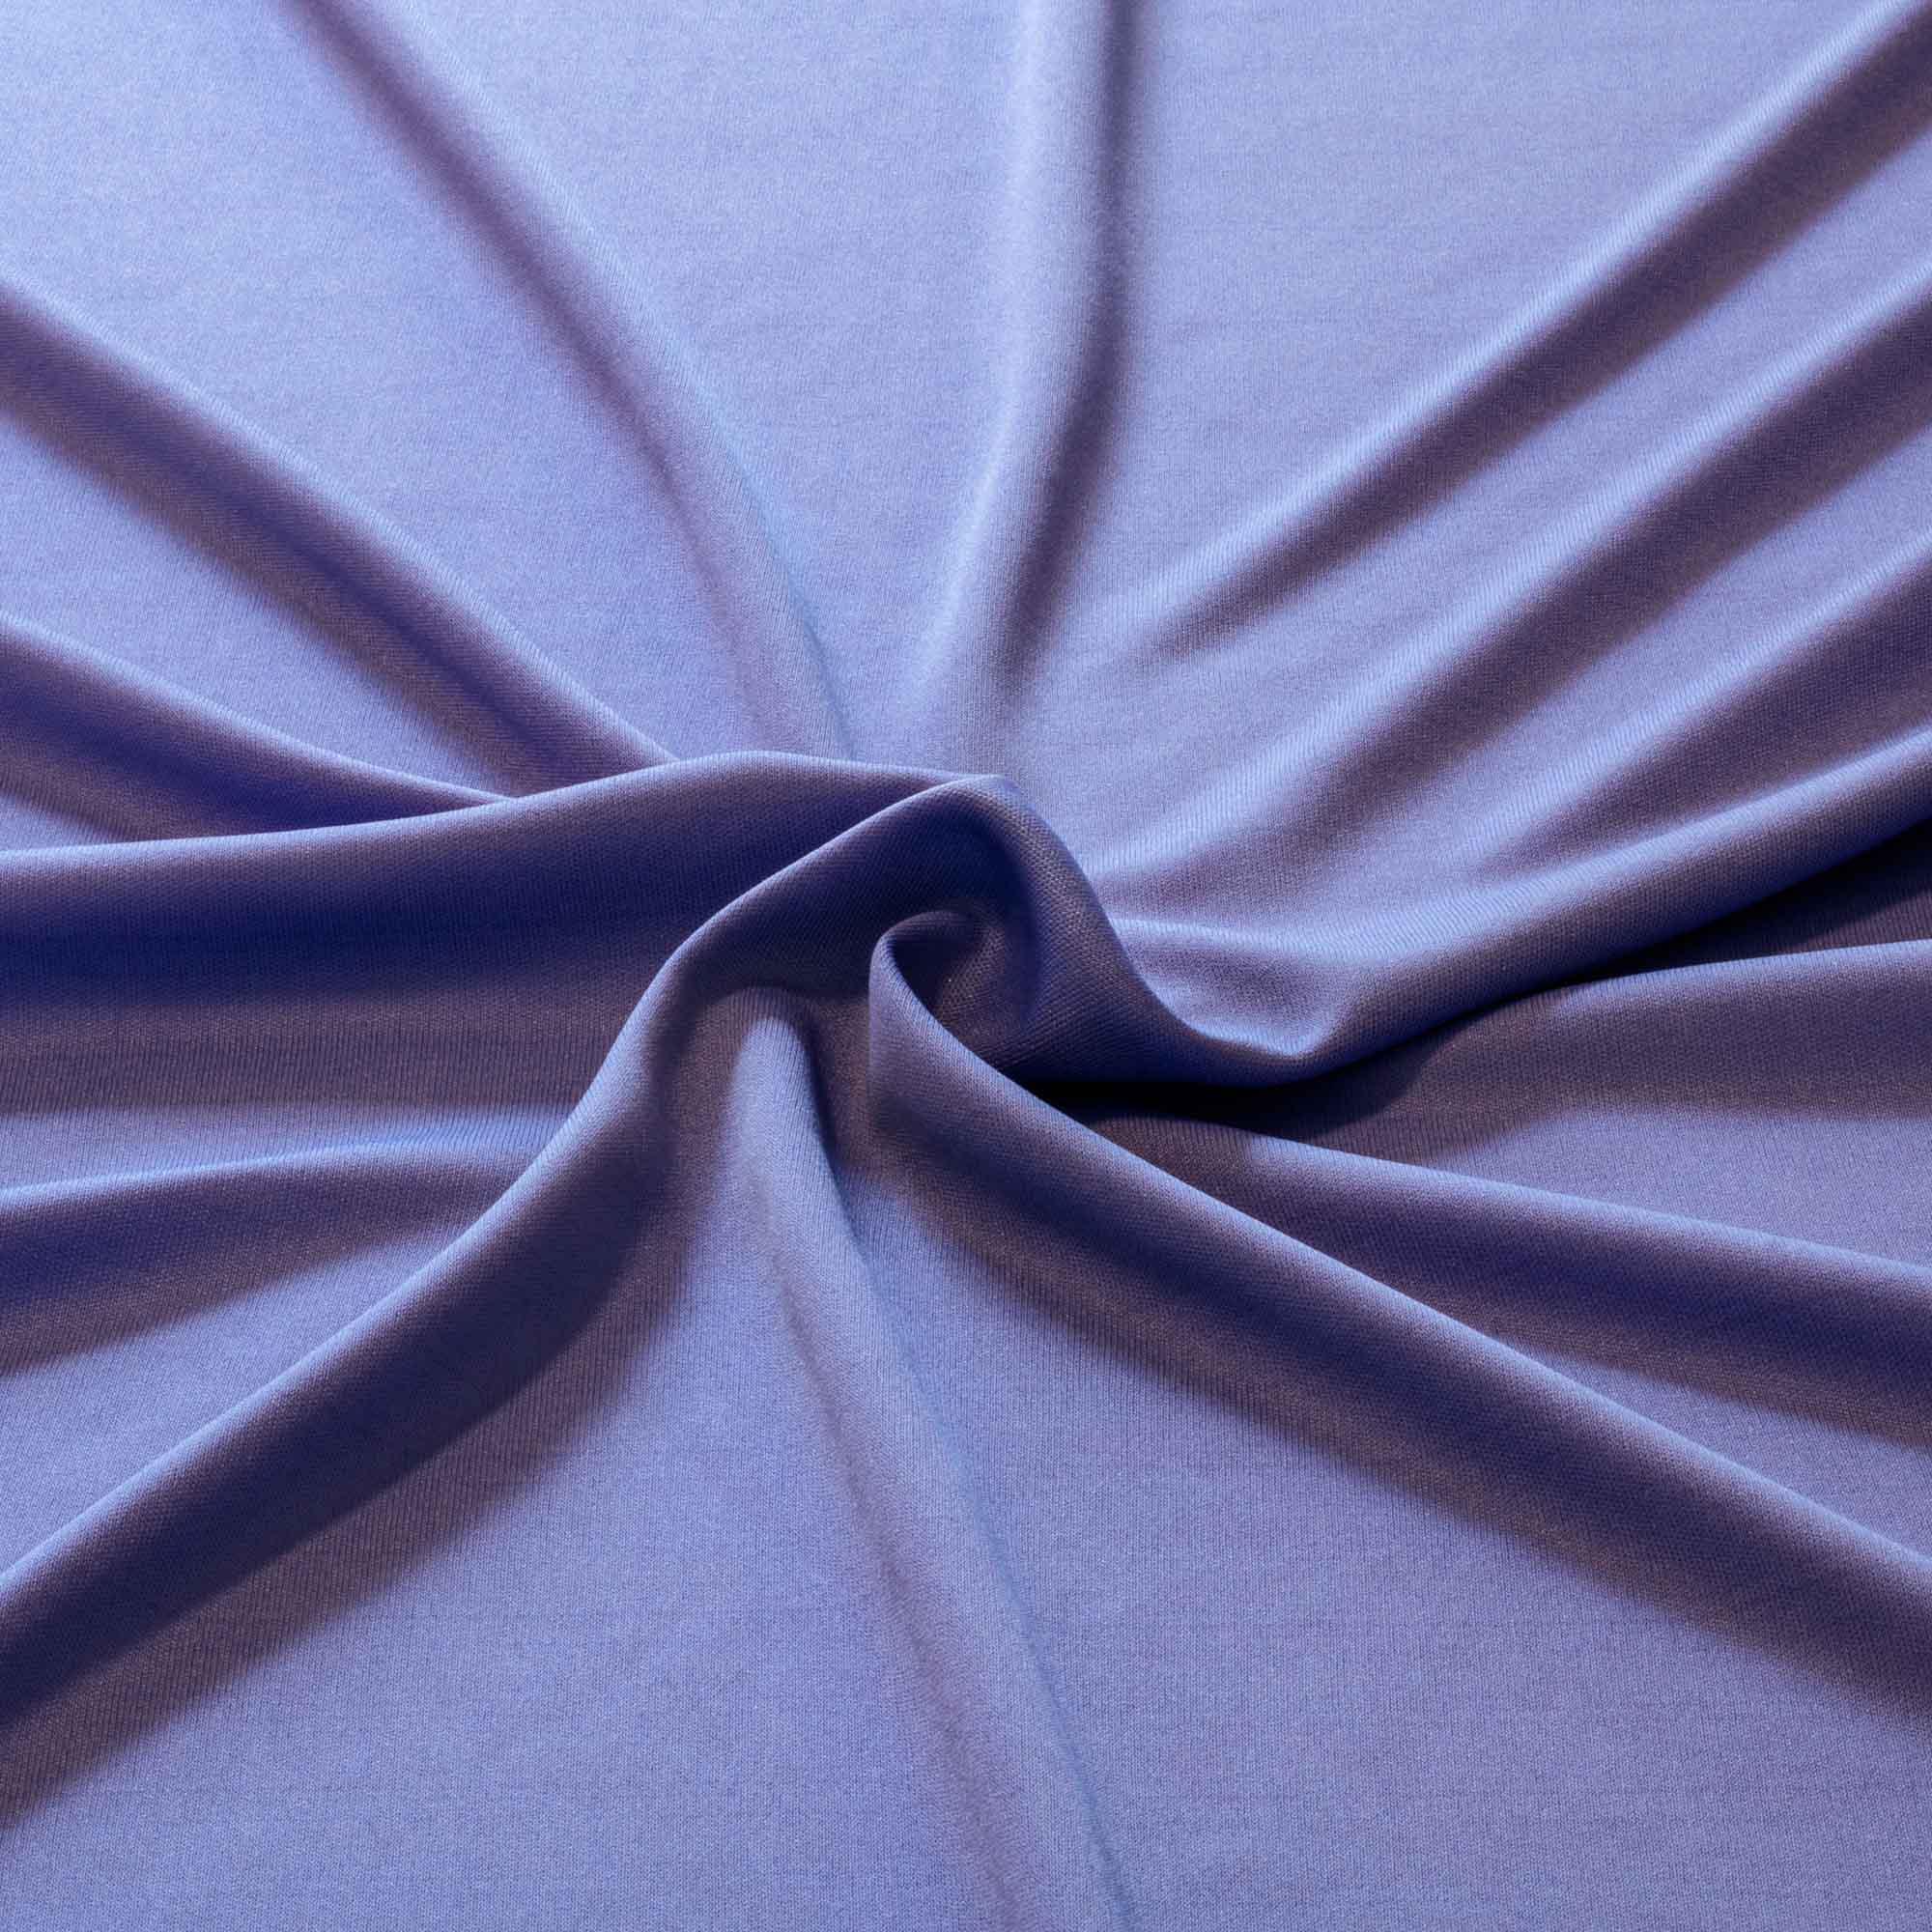 Tecido Malha Helanca Light Azul 100% Poliester 1,80 mt Largura